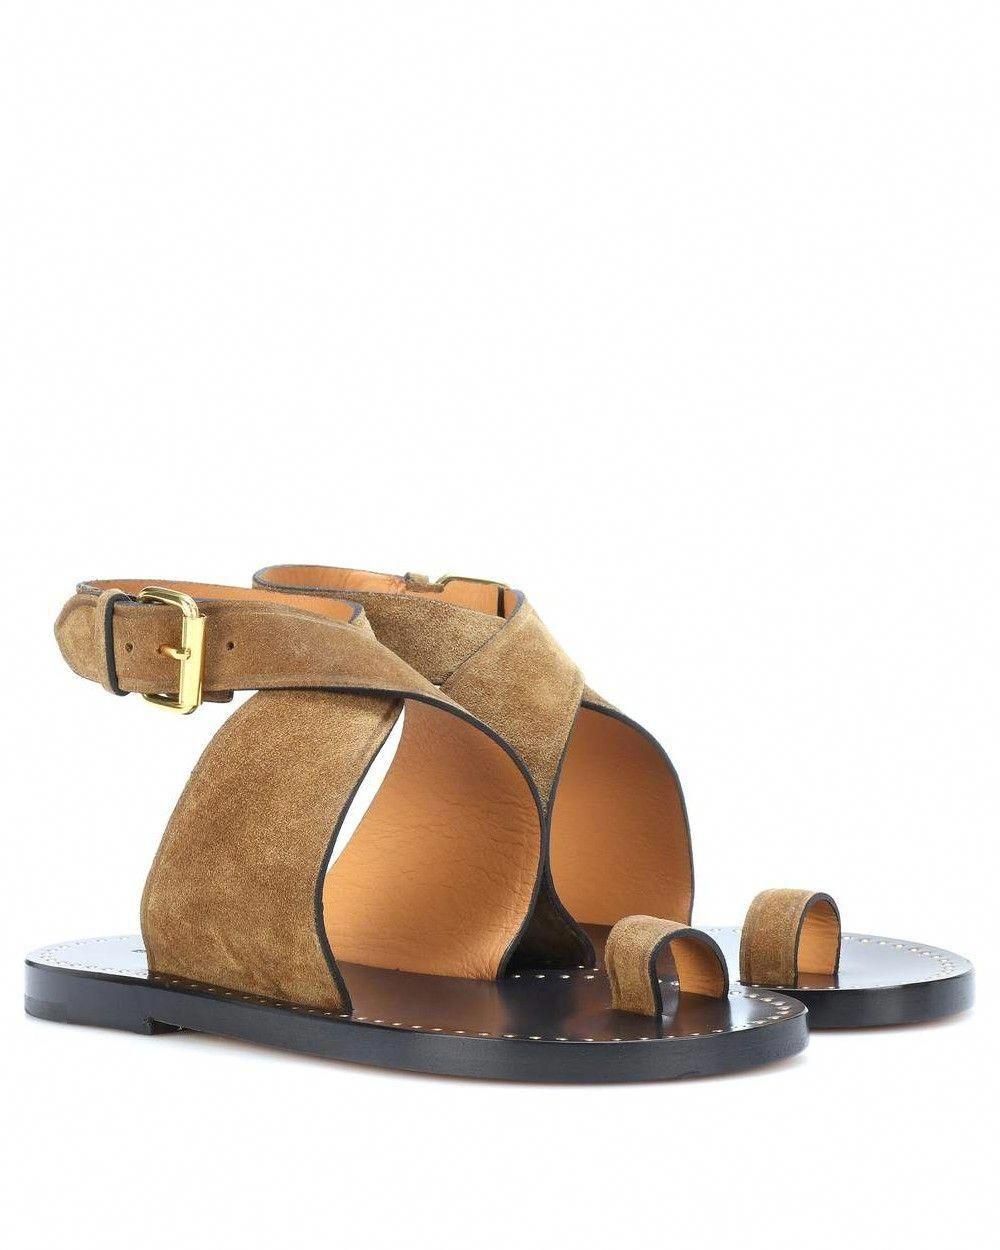 2c1e814be53c5 Amazon Women S Shoes Coupon #InexpensiveMensFashionShoes | Sandals ...